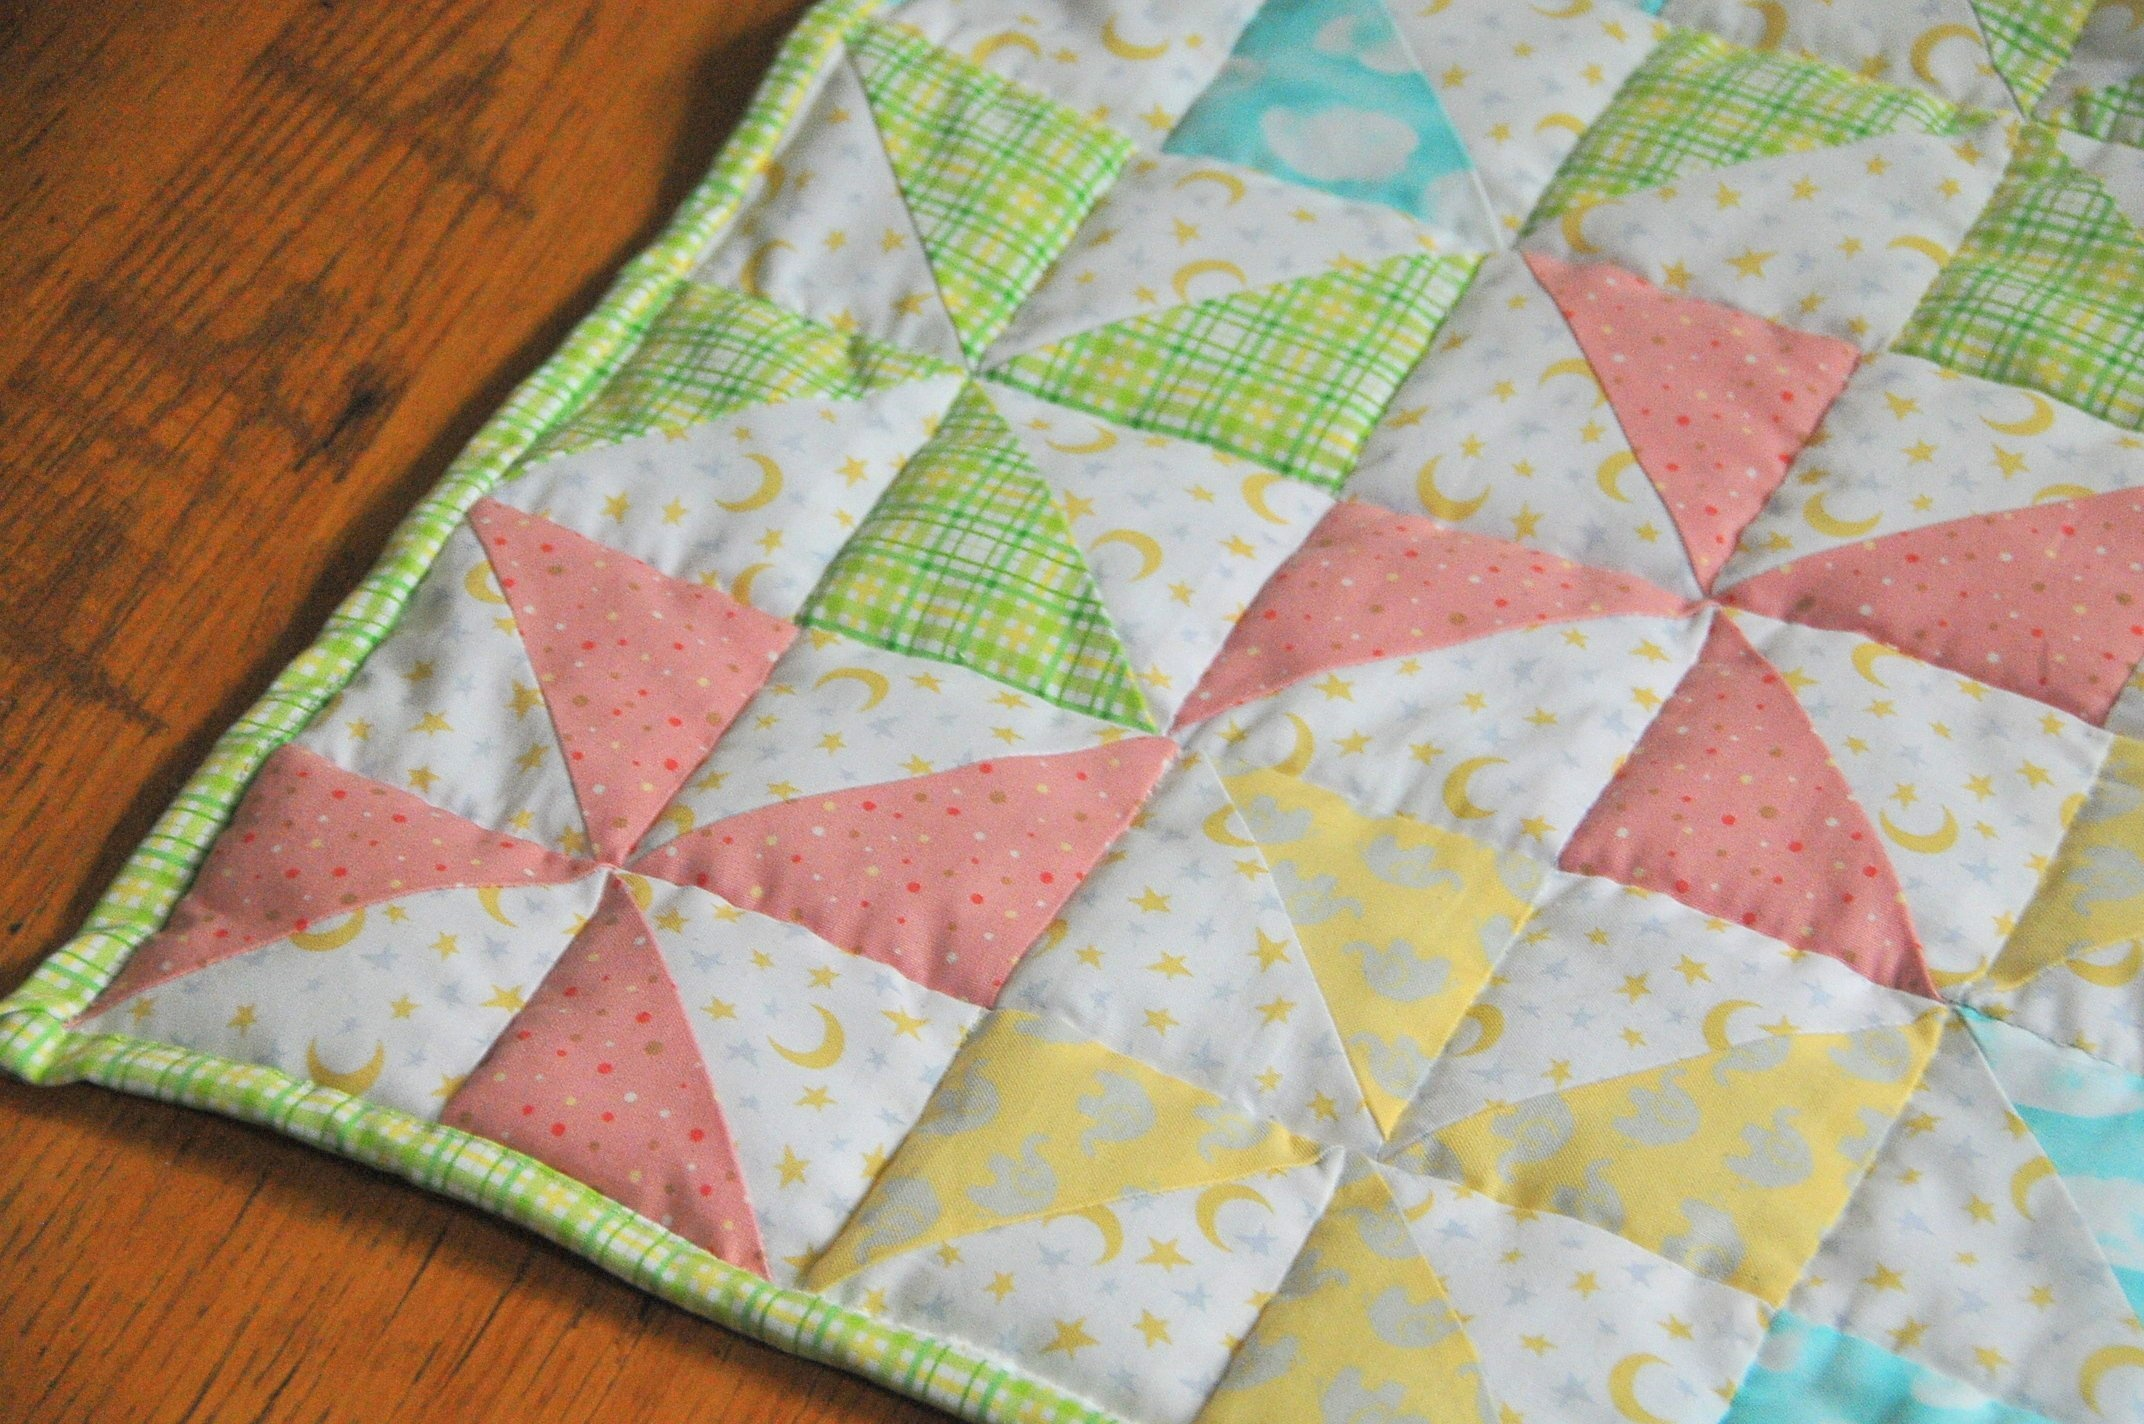 Barn Quilt Patterns Free Joy Studio Design Gallery Printable Baby - Free Printable Barn Quilt Patterns